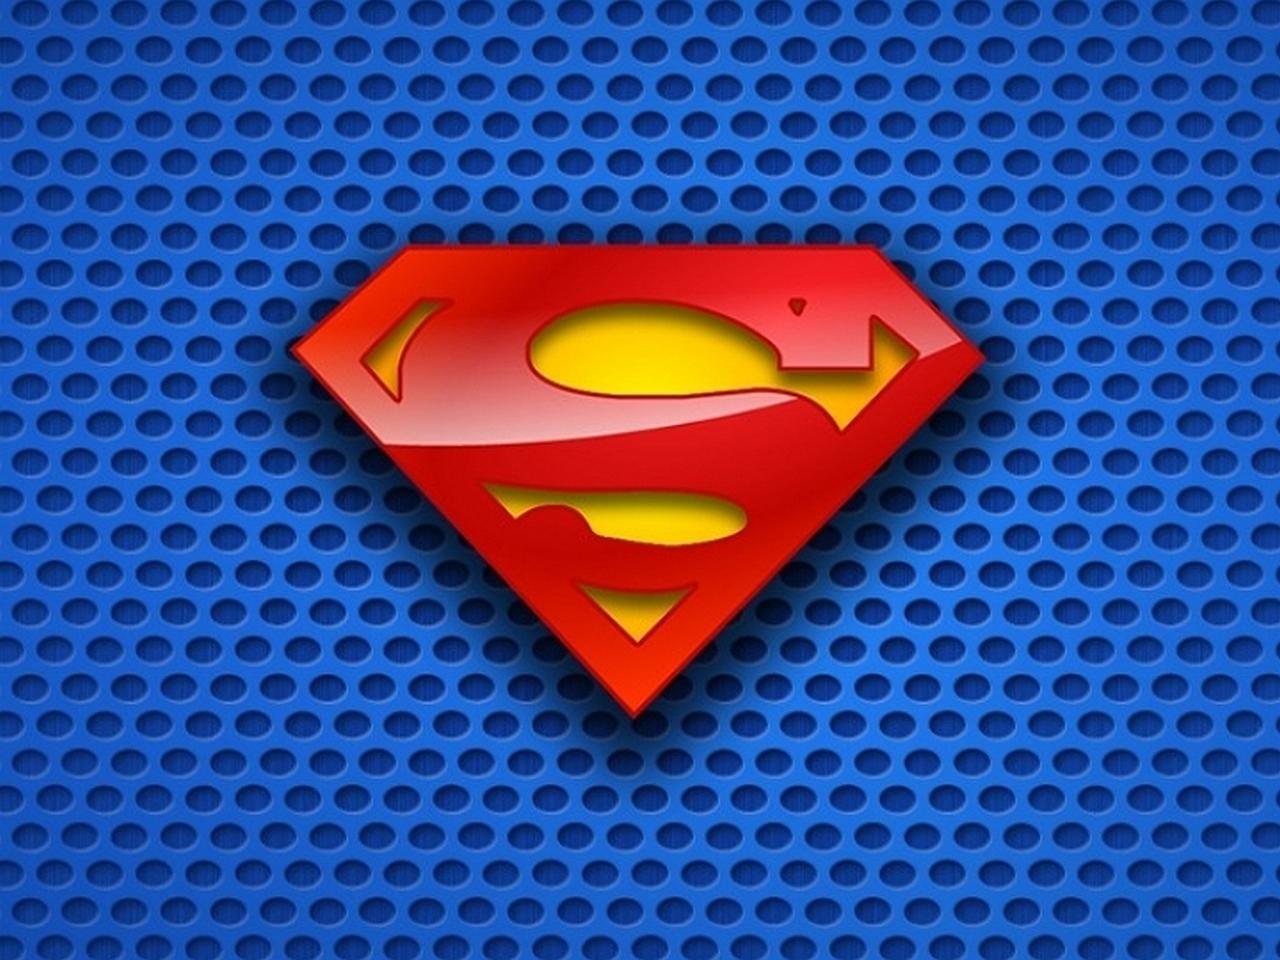 Wallpaper Abyss Explore the Collection Superman Comics Superman 411311 1280x960